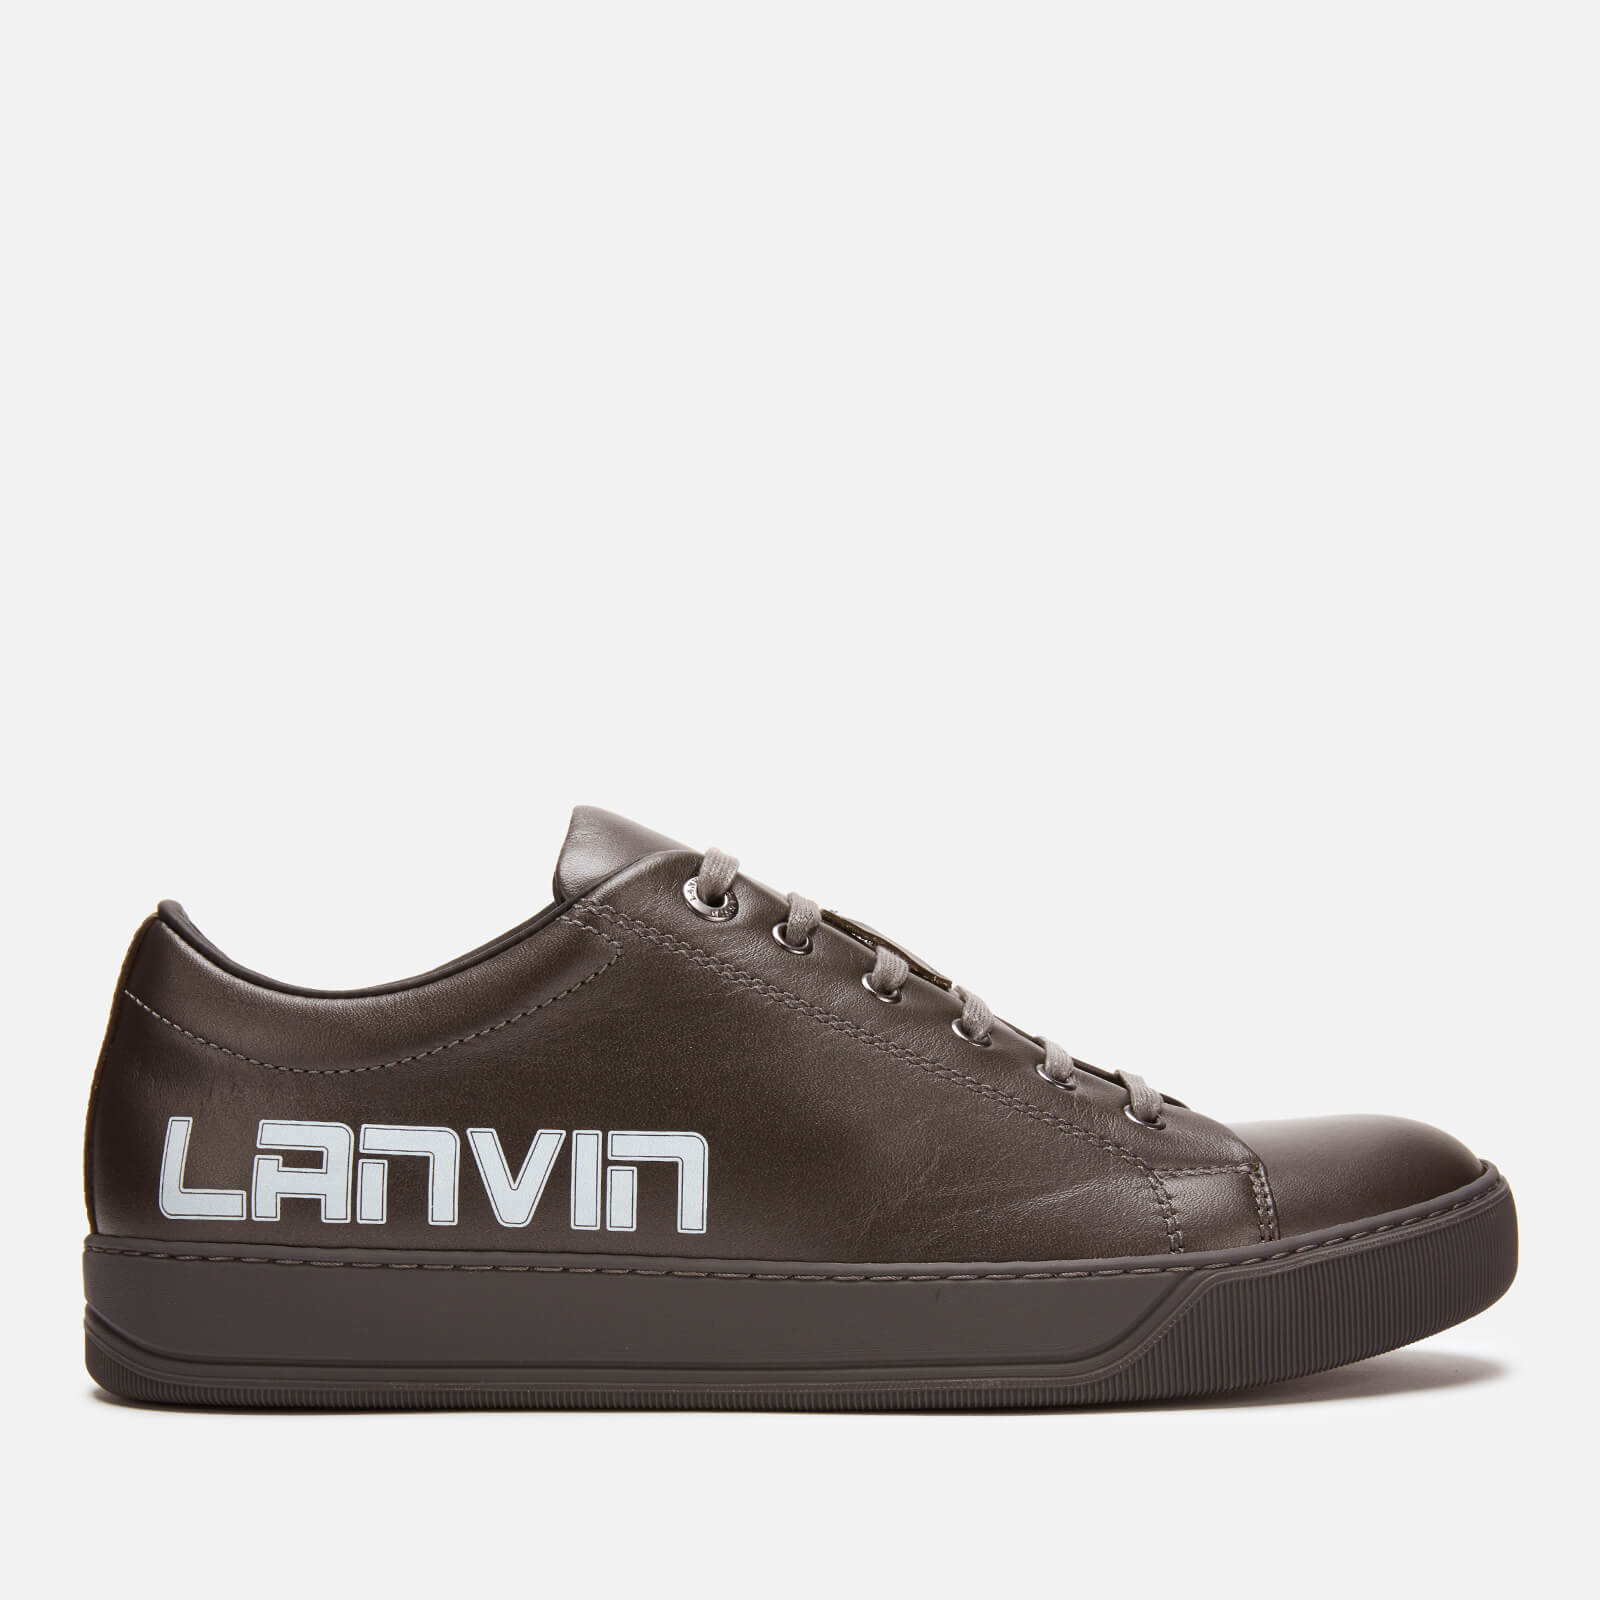 LANVIN 男士运动鞋